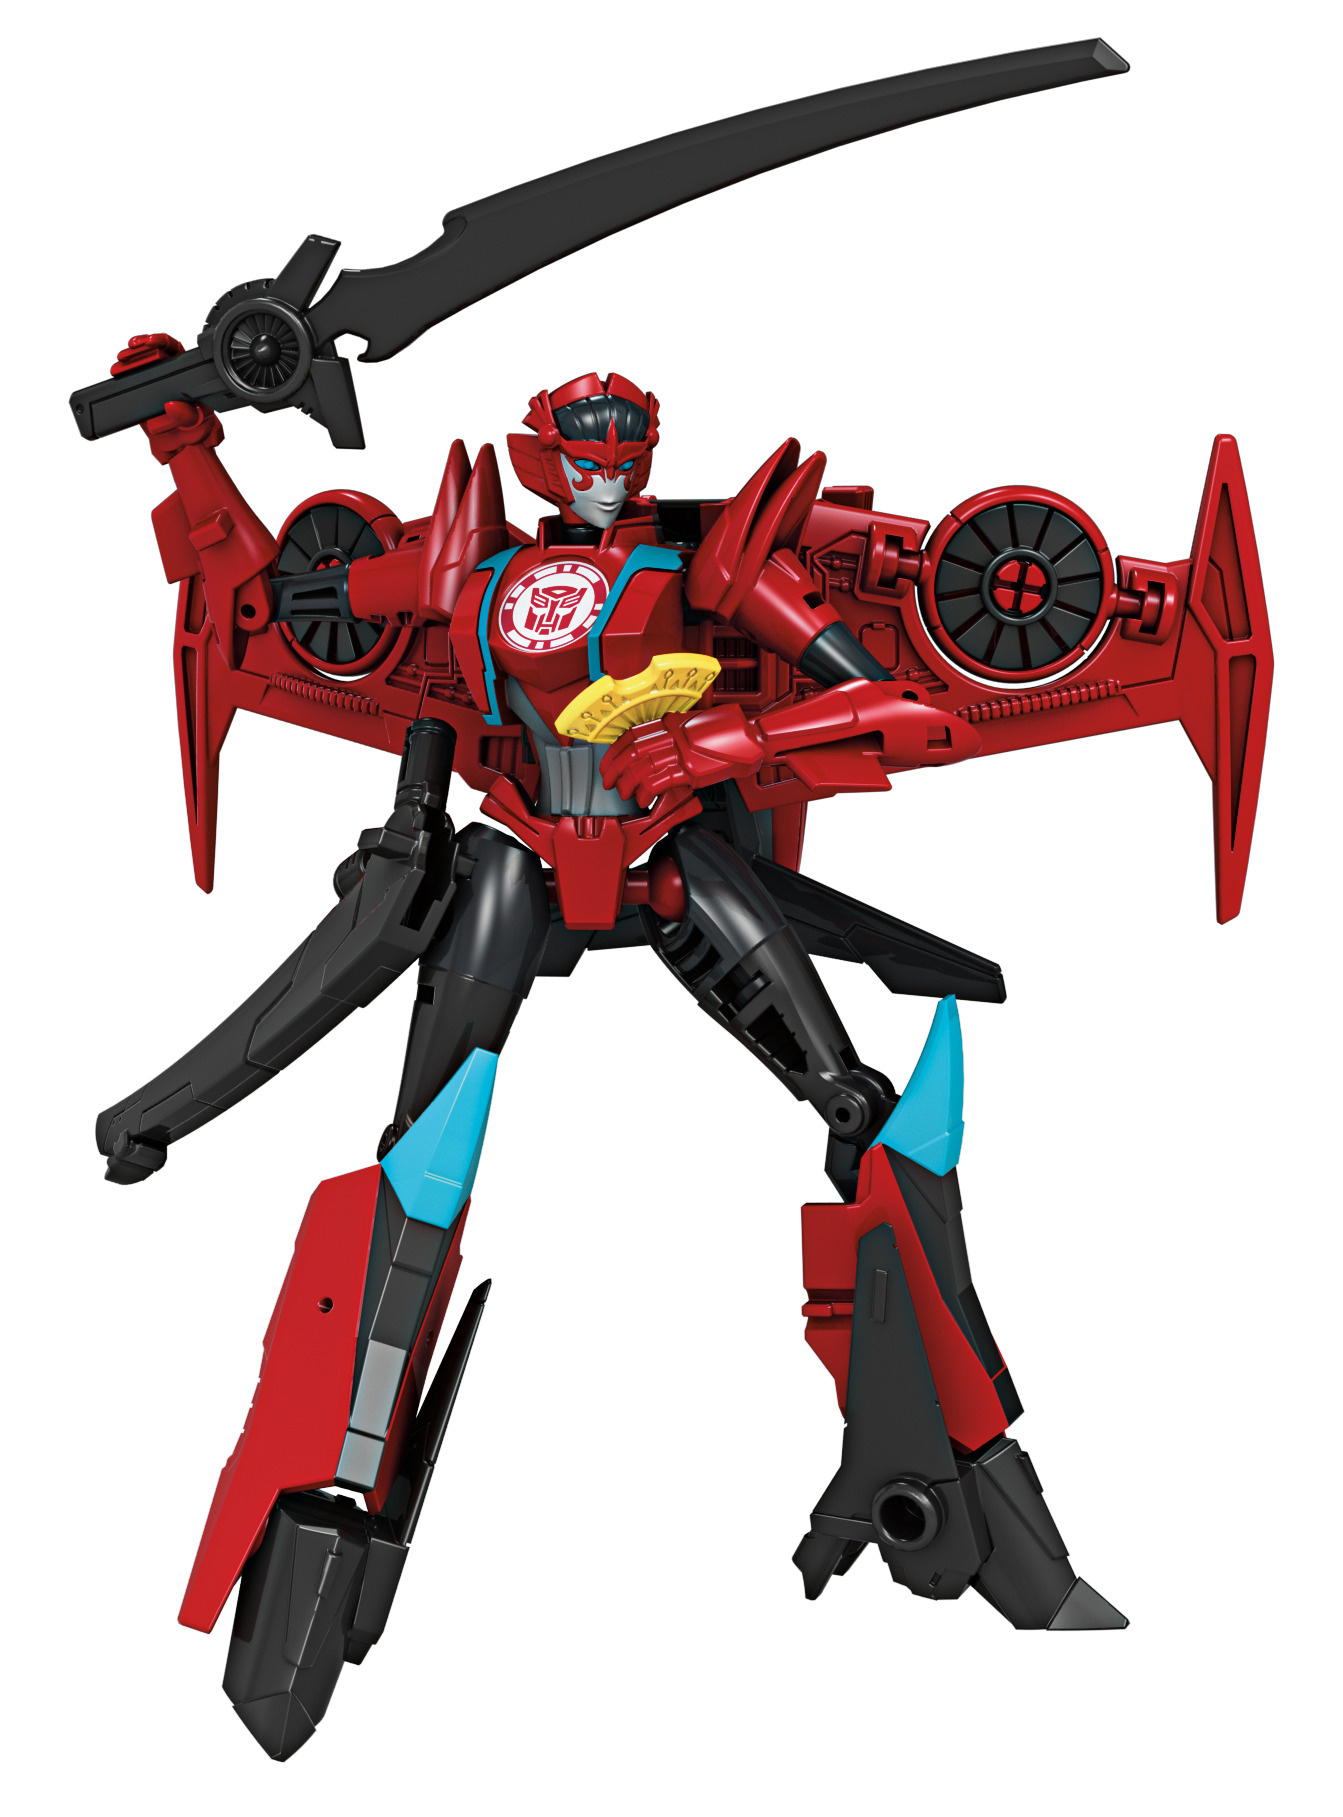 Windblade Transformers Toys TFW2005